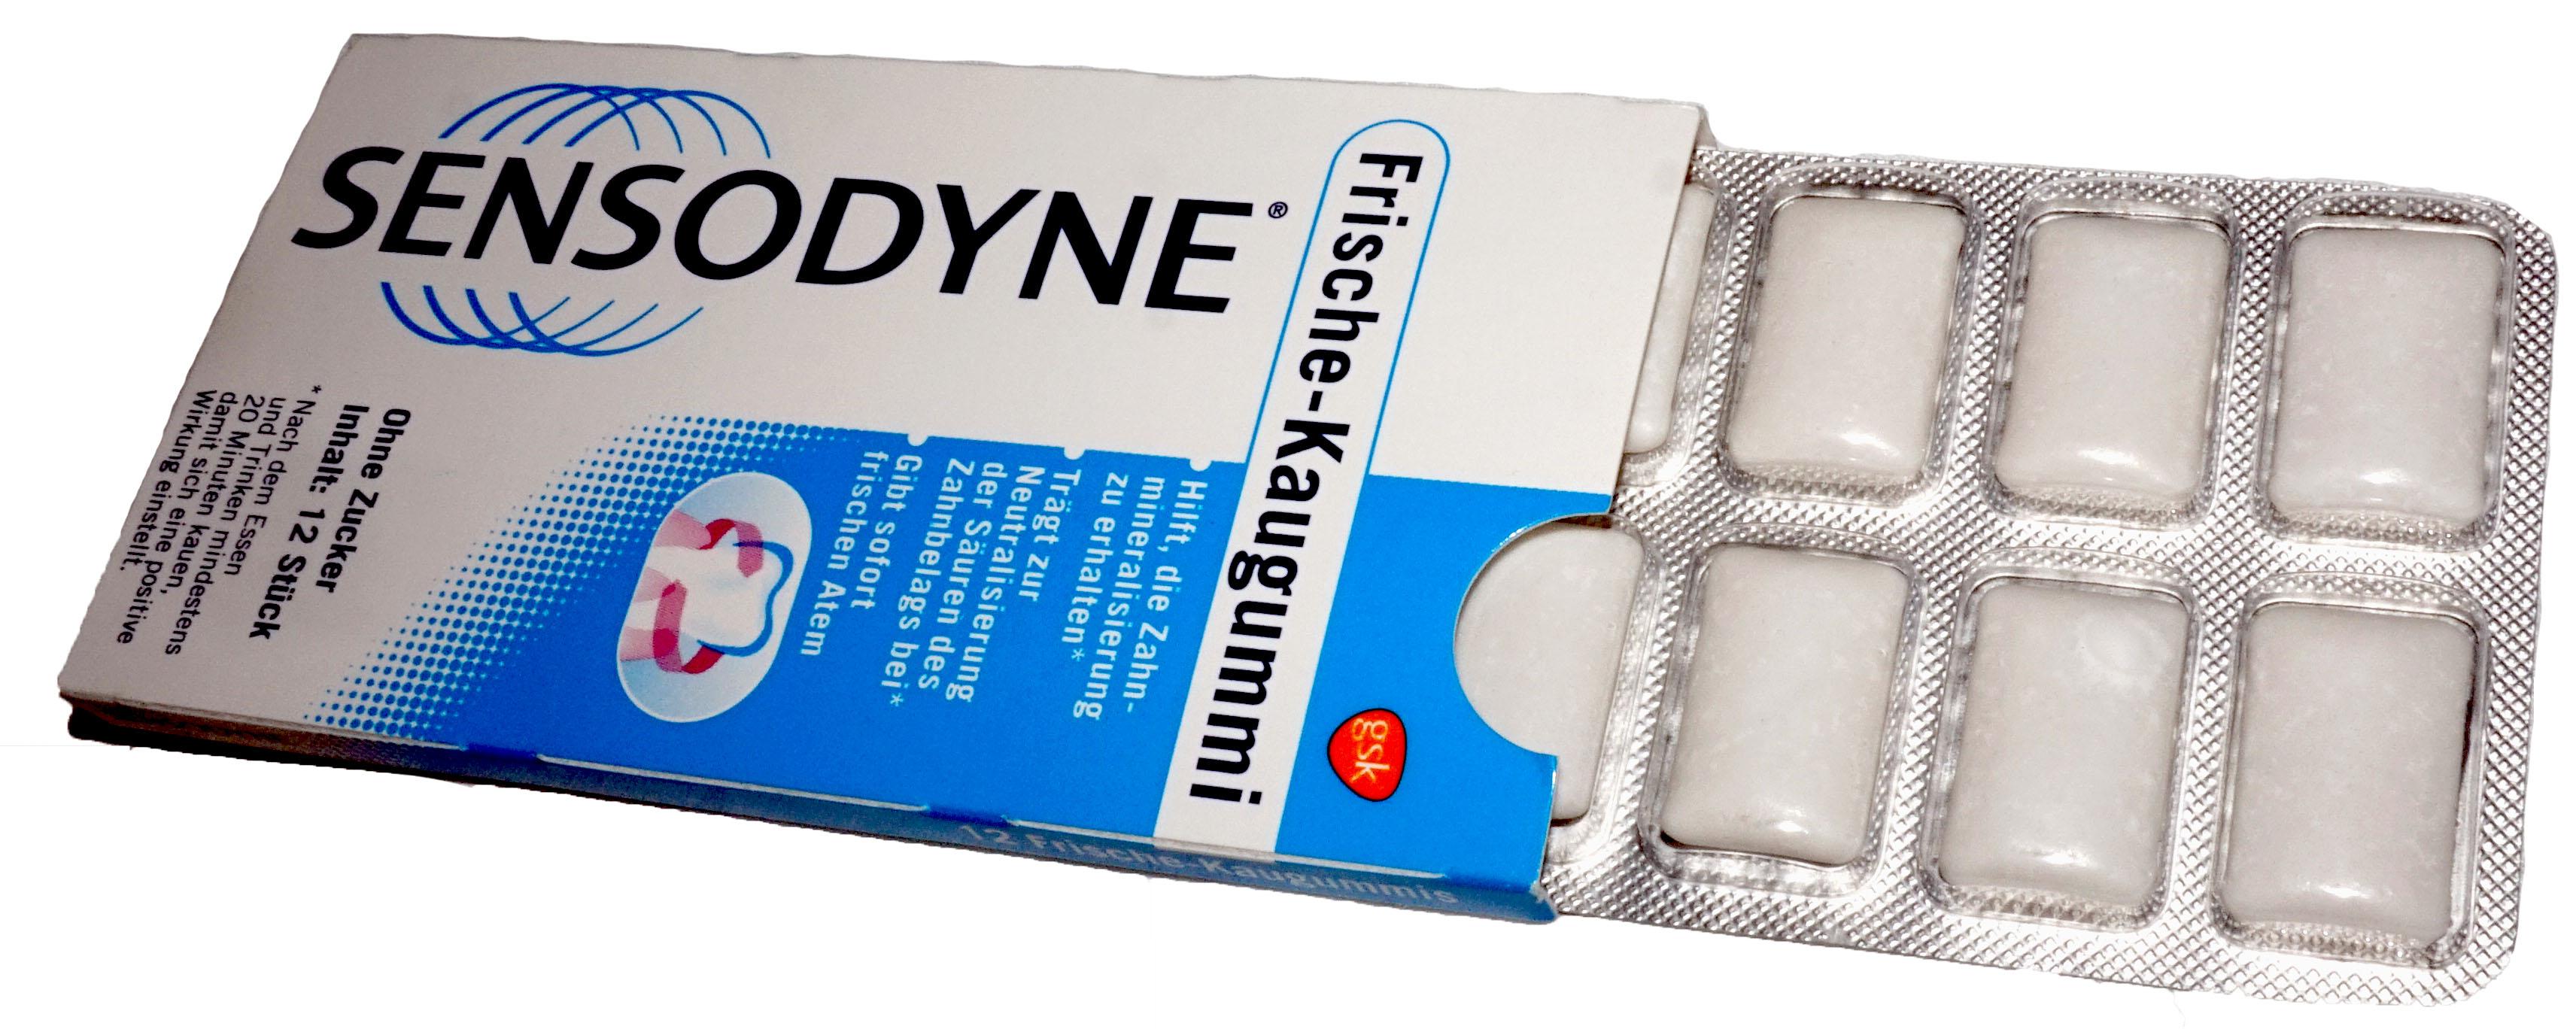 File:Sensodyne chewing gum.jpg